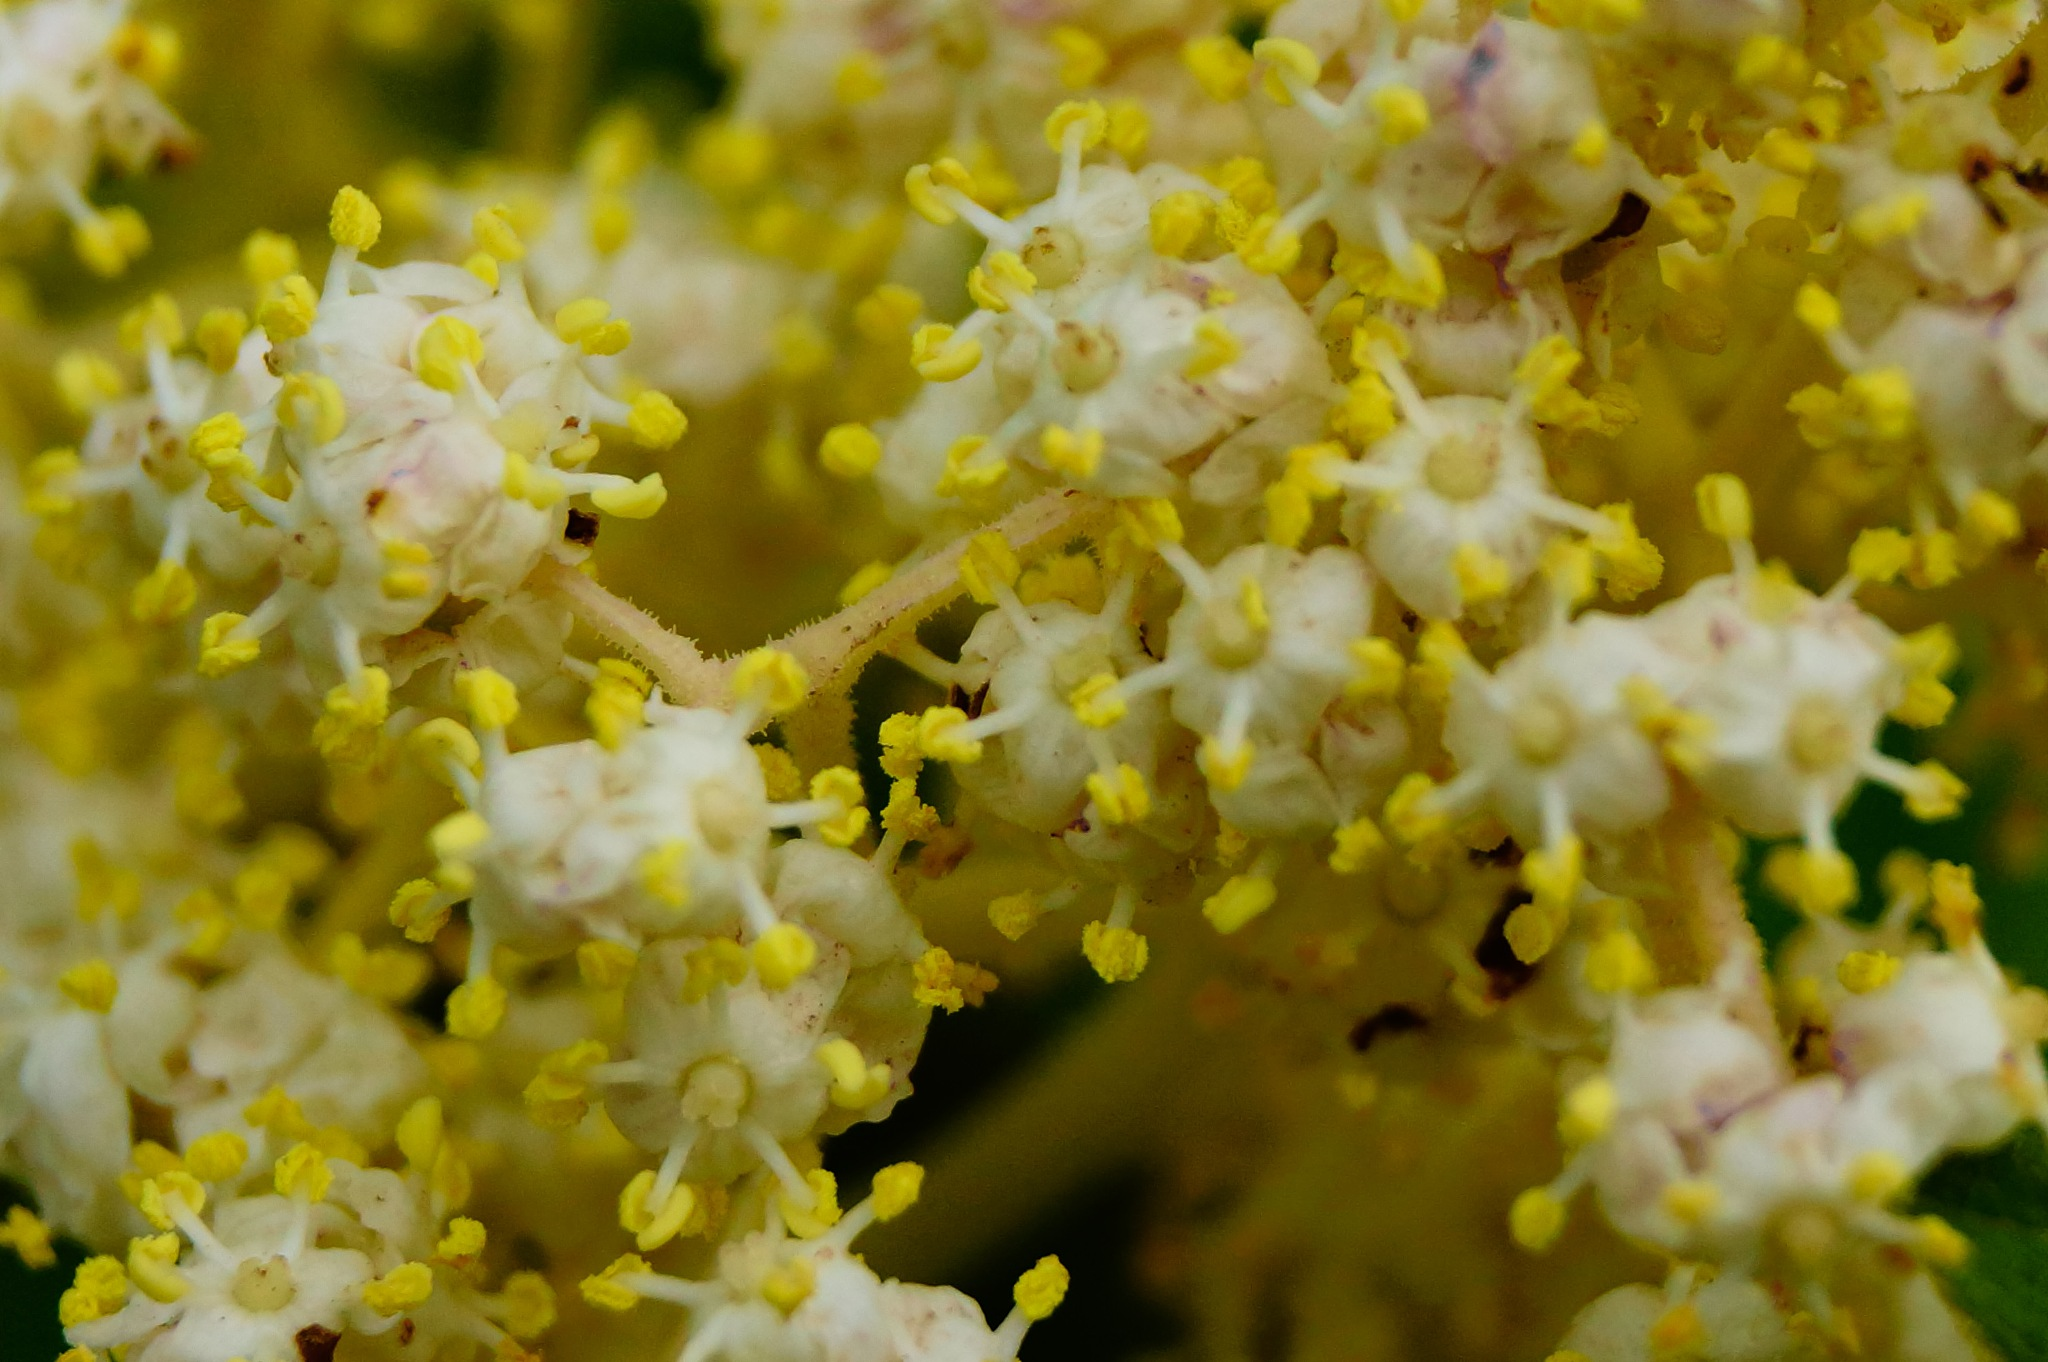 Flower Burst by Brian Hannah